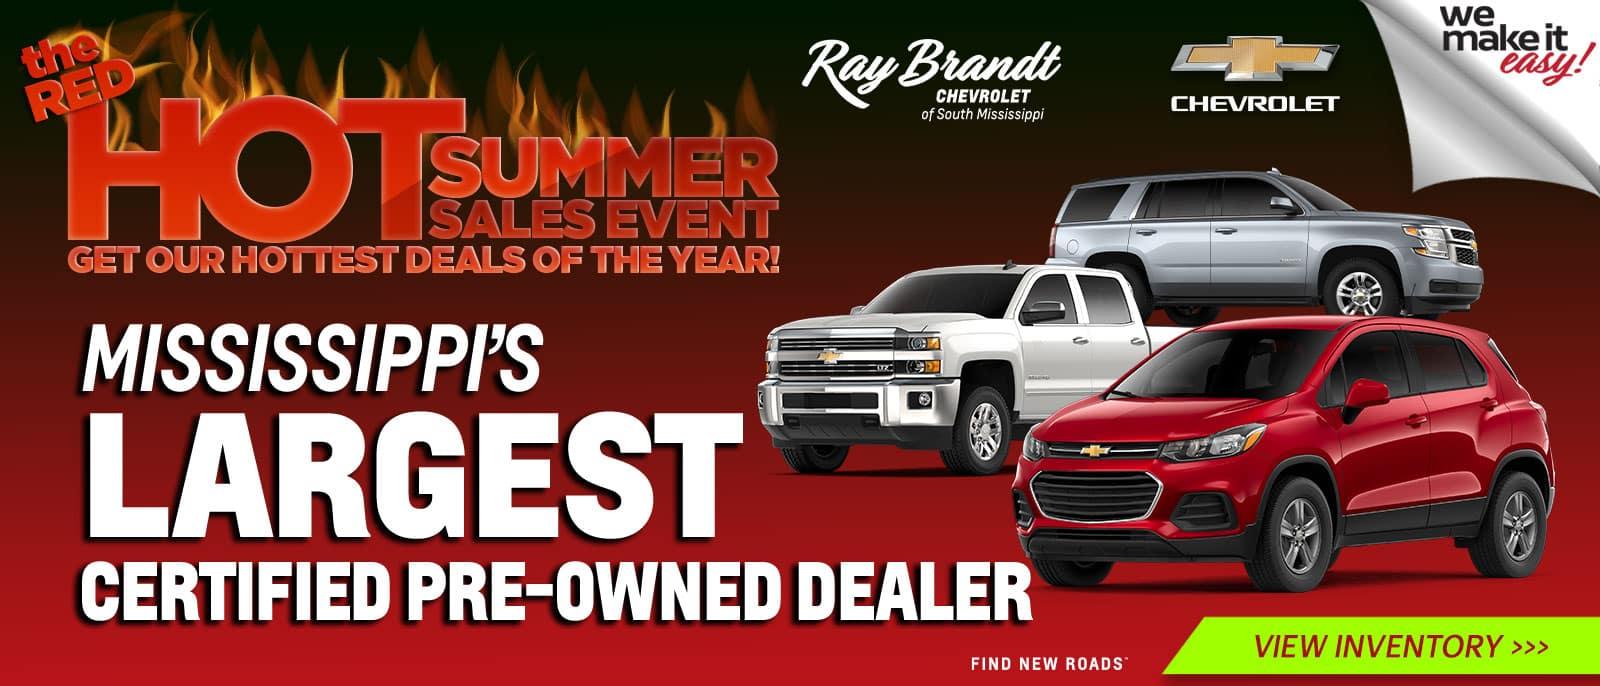 Ray Brandt Chevrolet